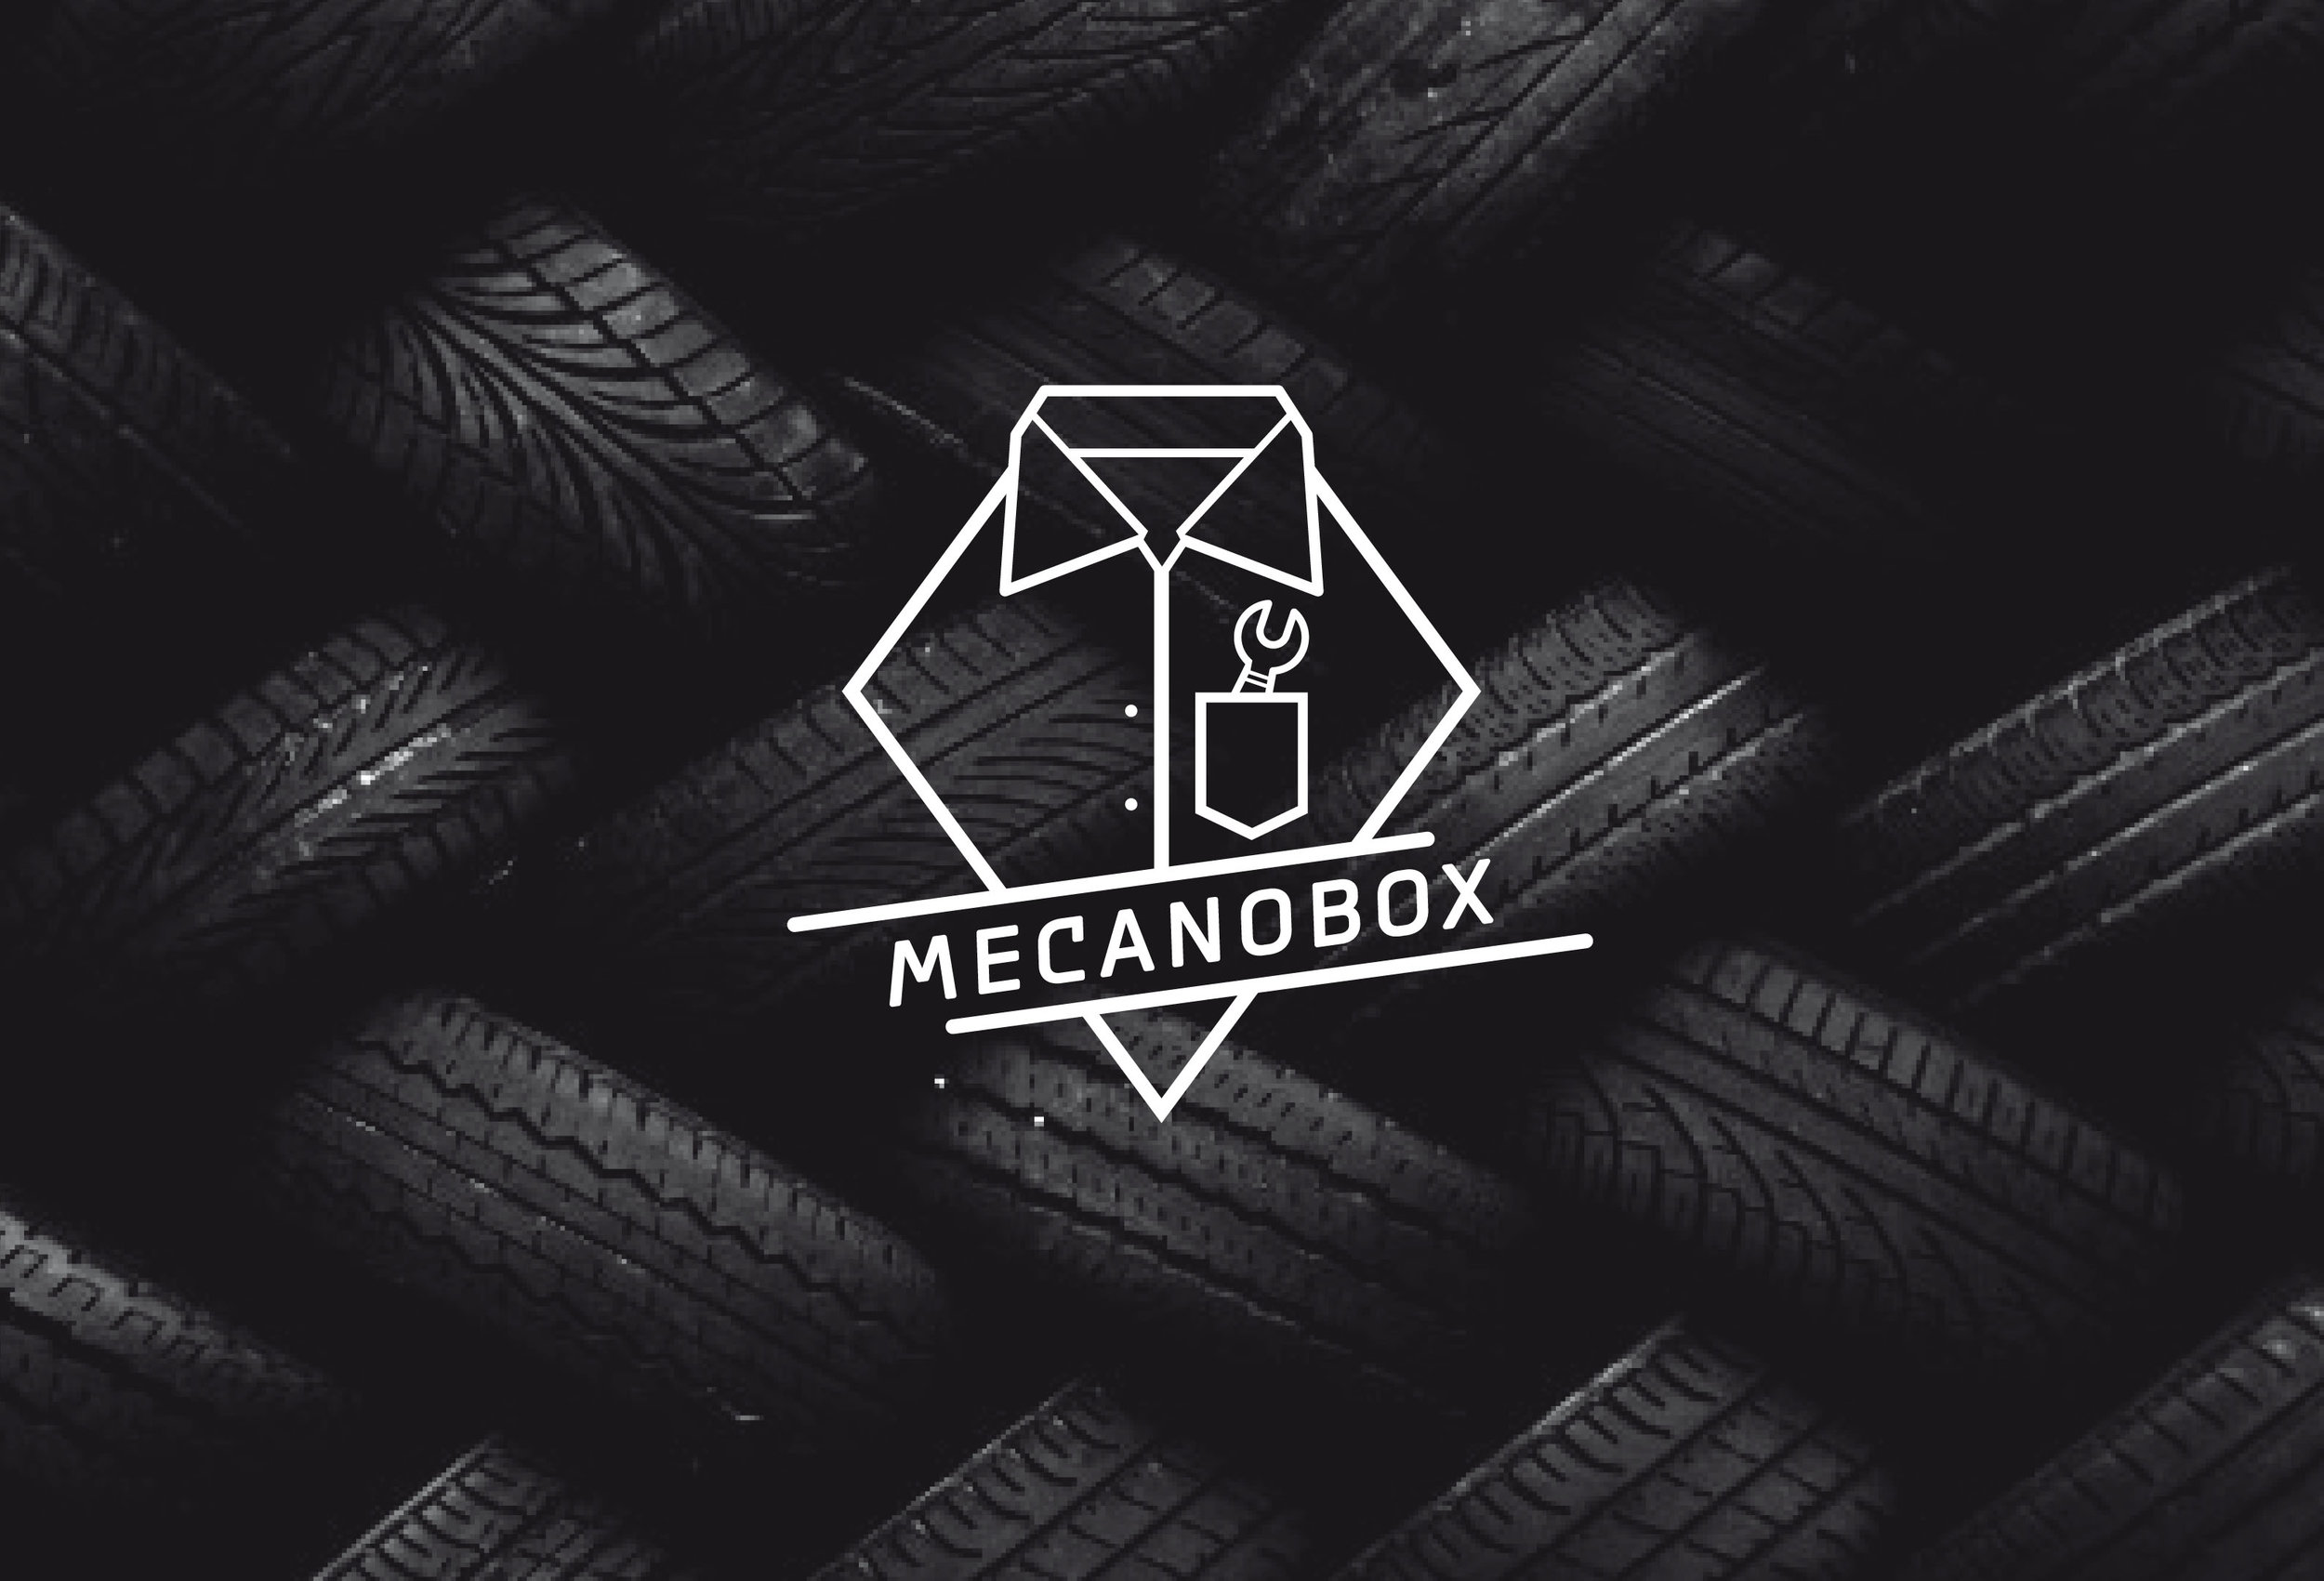 MECANOBOX1.jpg